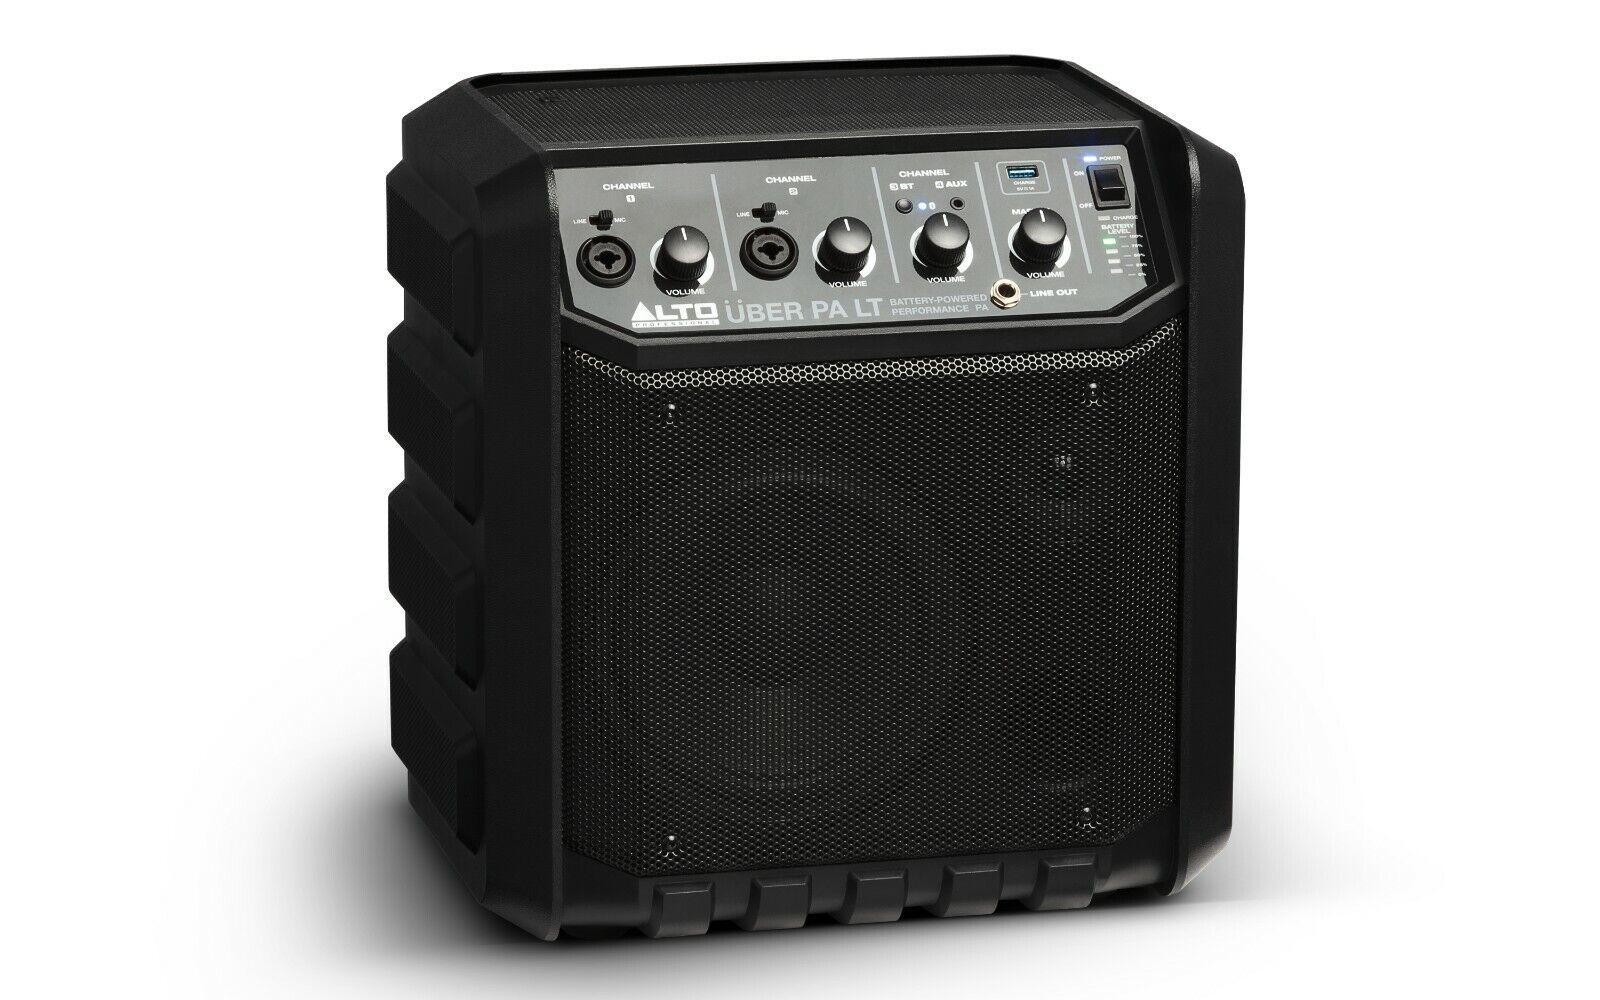 ALTO PROFESSIONAL UBER LT 50 Watt Portable Rechargeable Blue